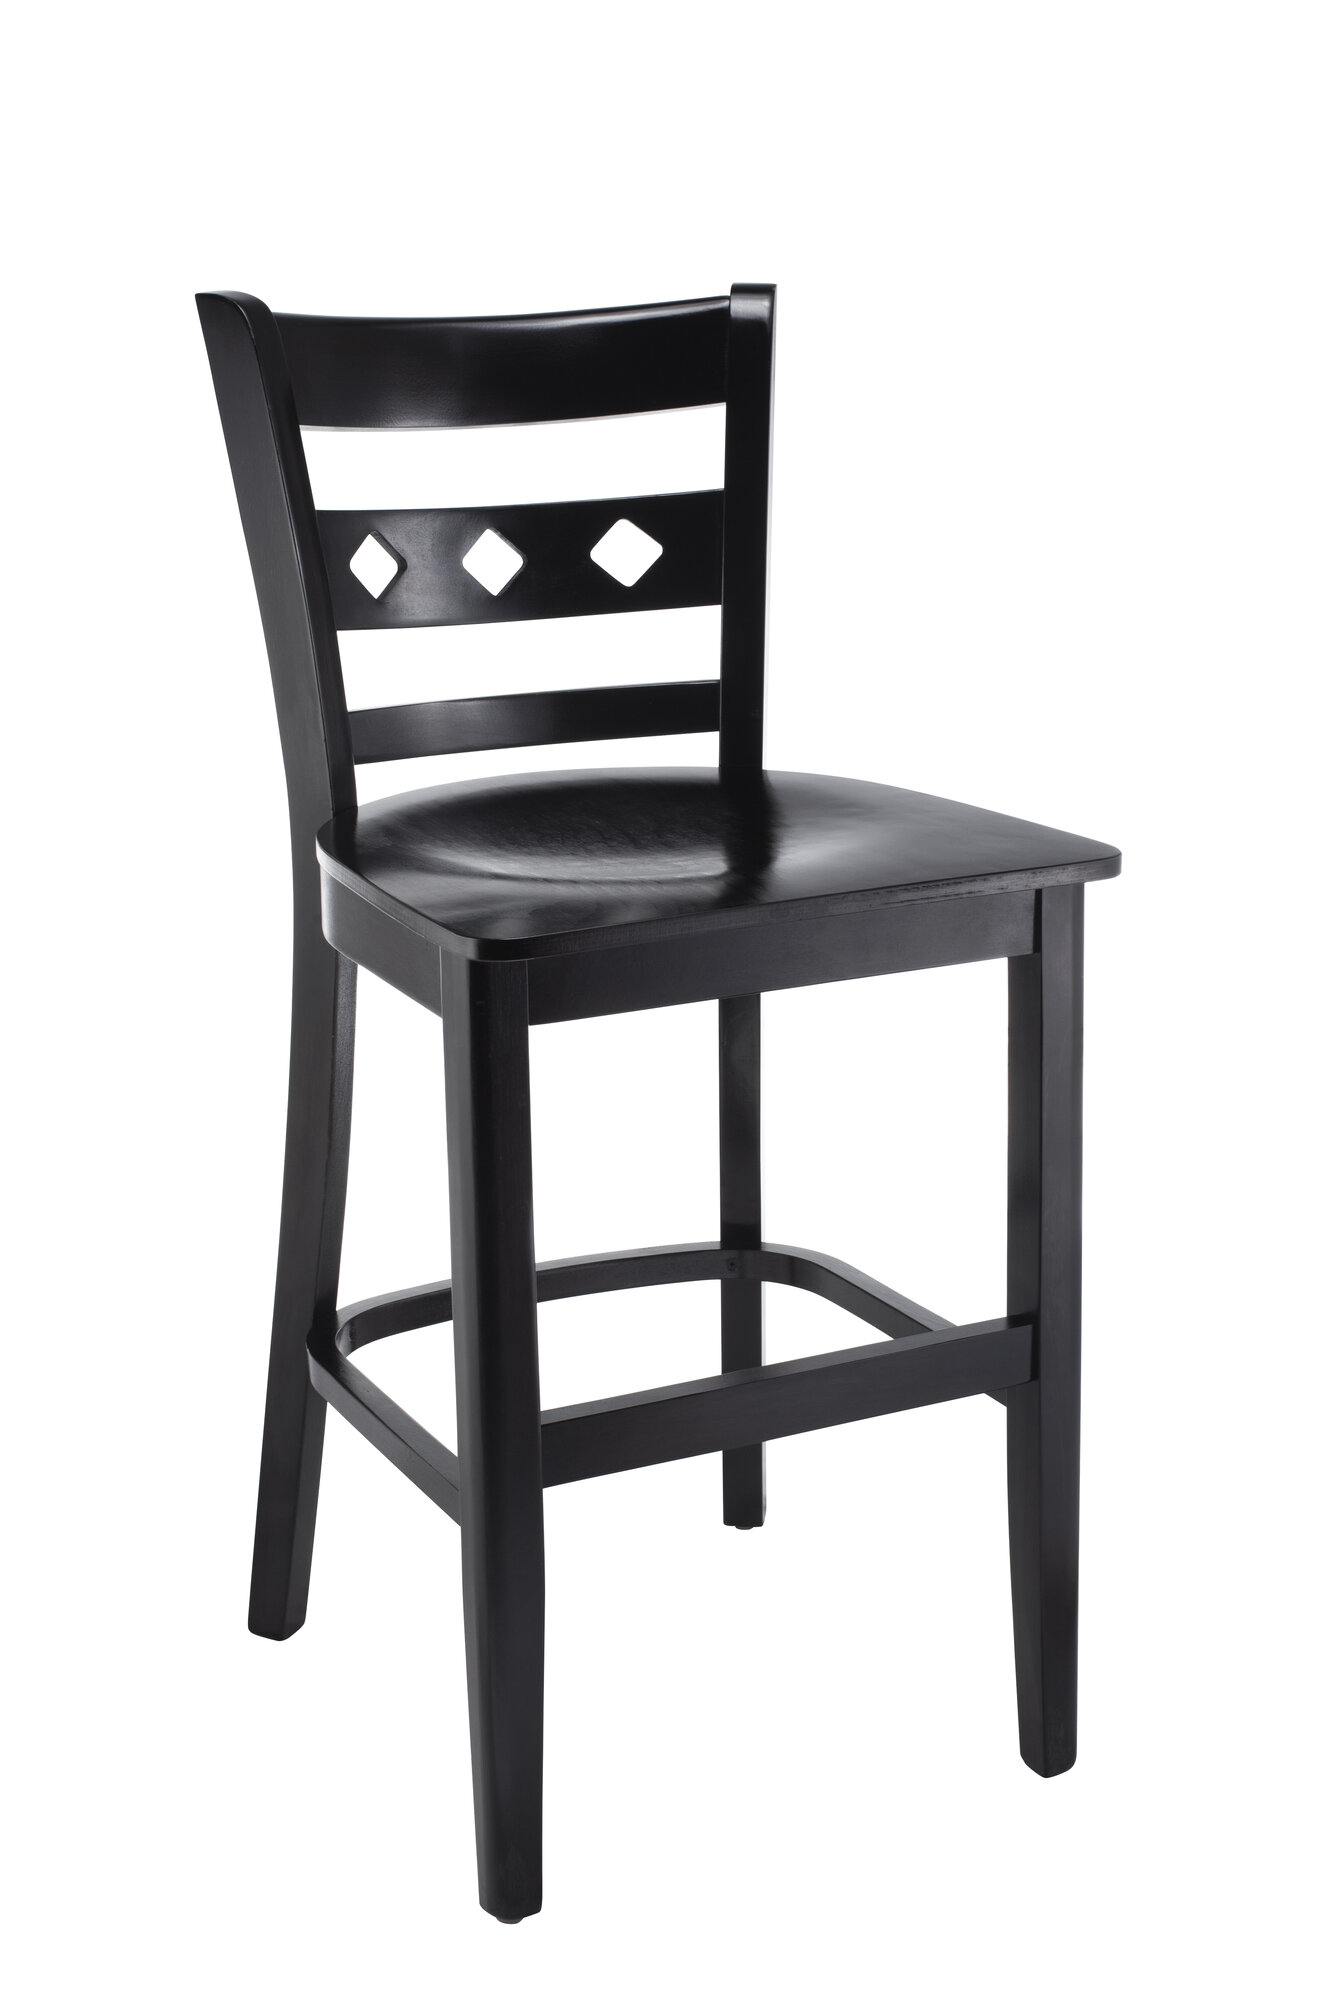 Cool Details About Red Barrel Studio Ewell 24 Bar Stool Uwap Interior Chair Design Uwaporg